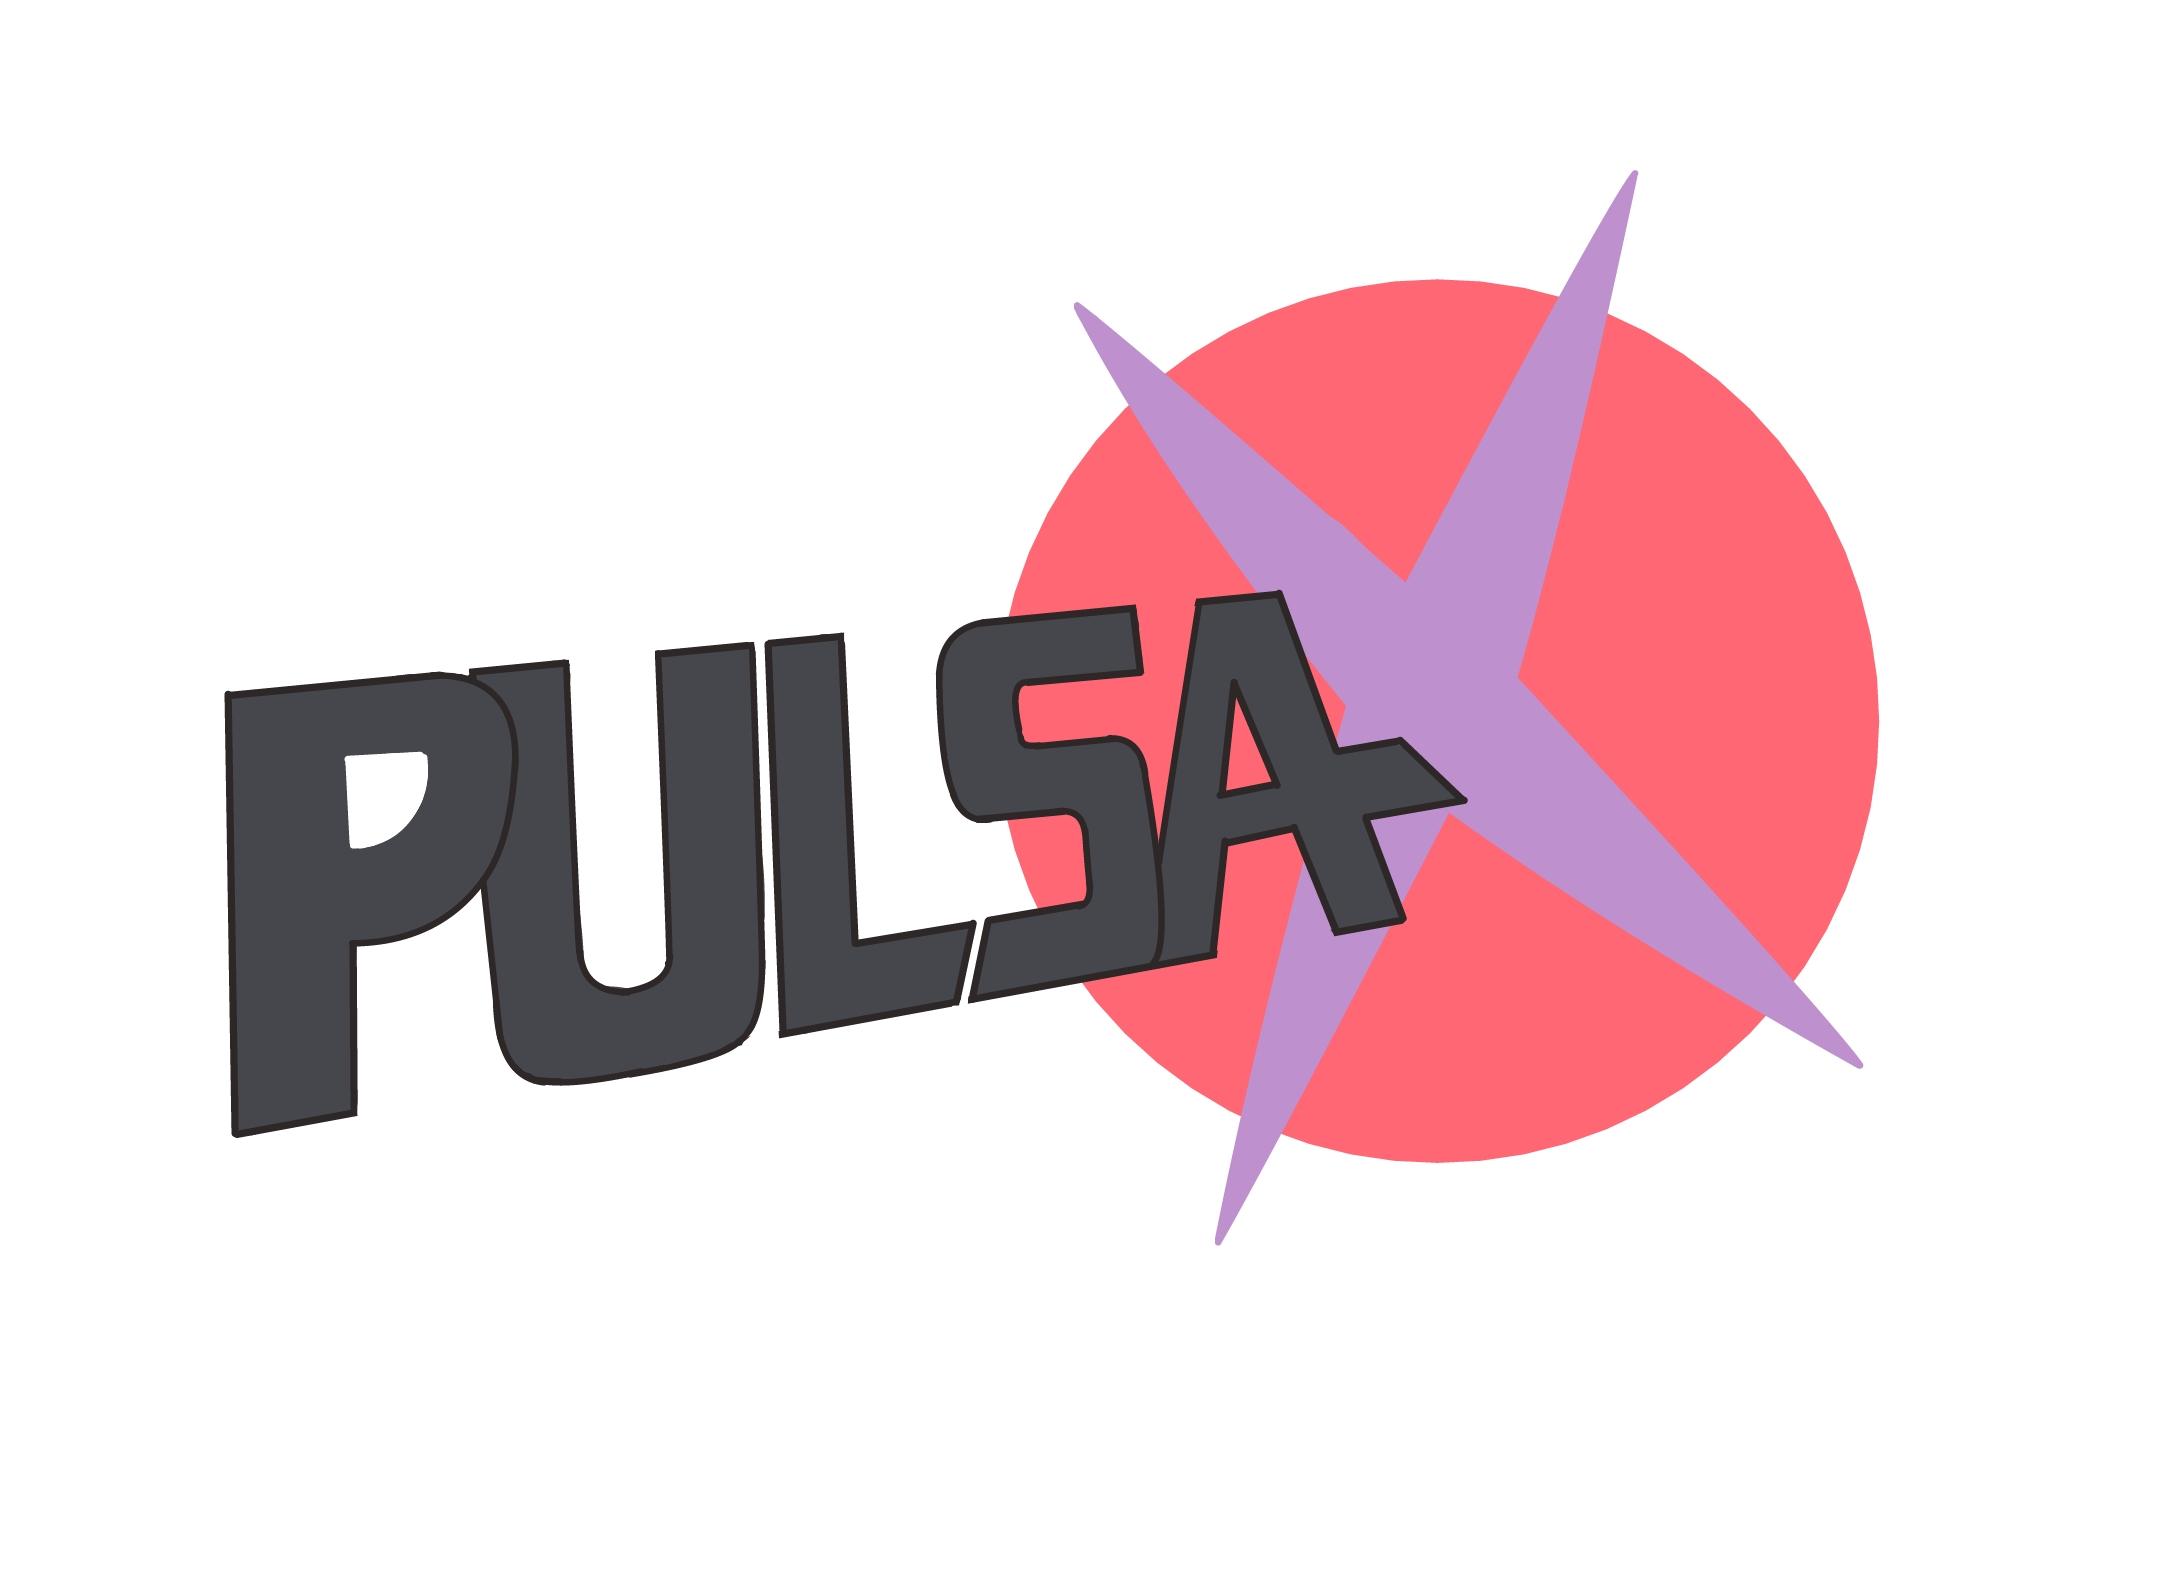 PULSAX-PROGRAMA11